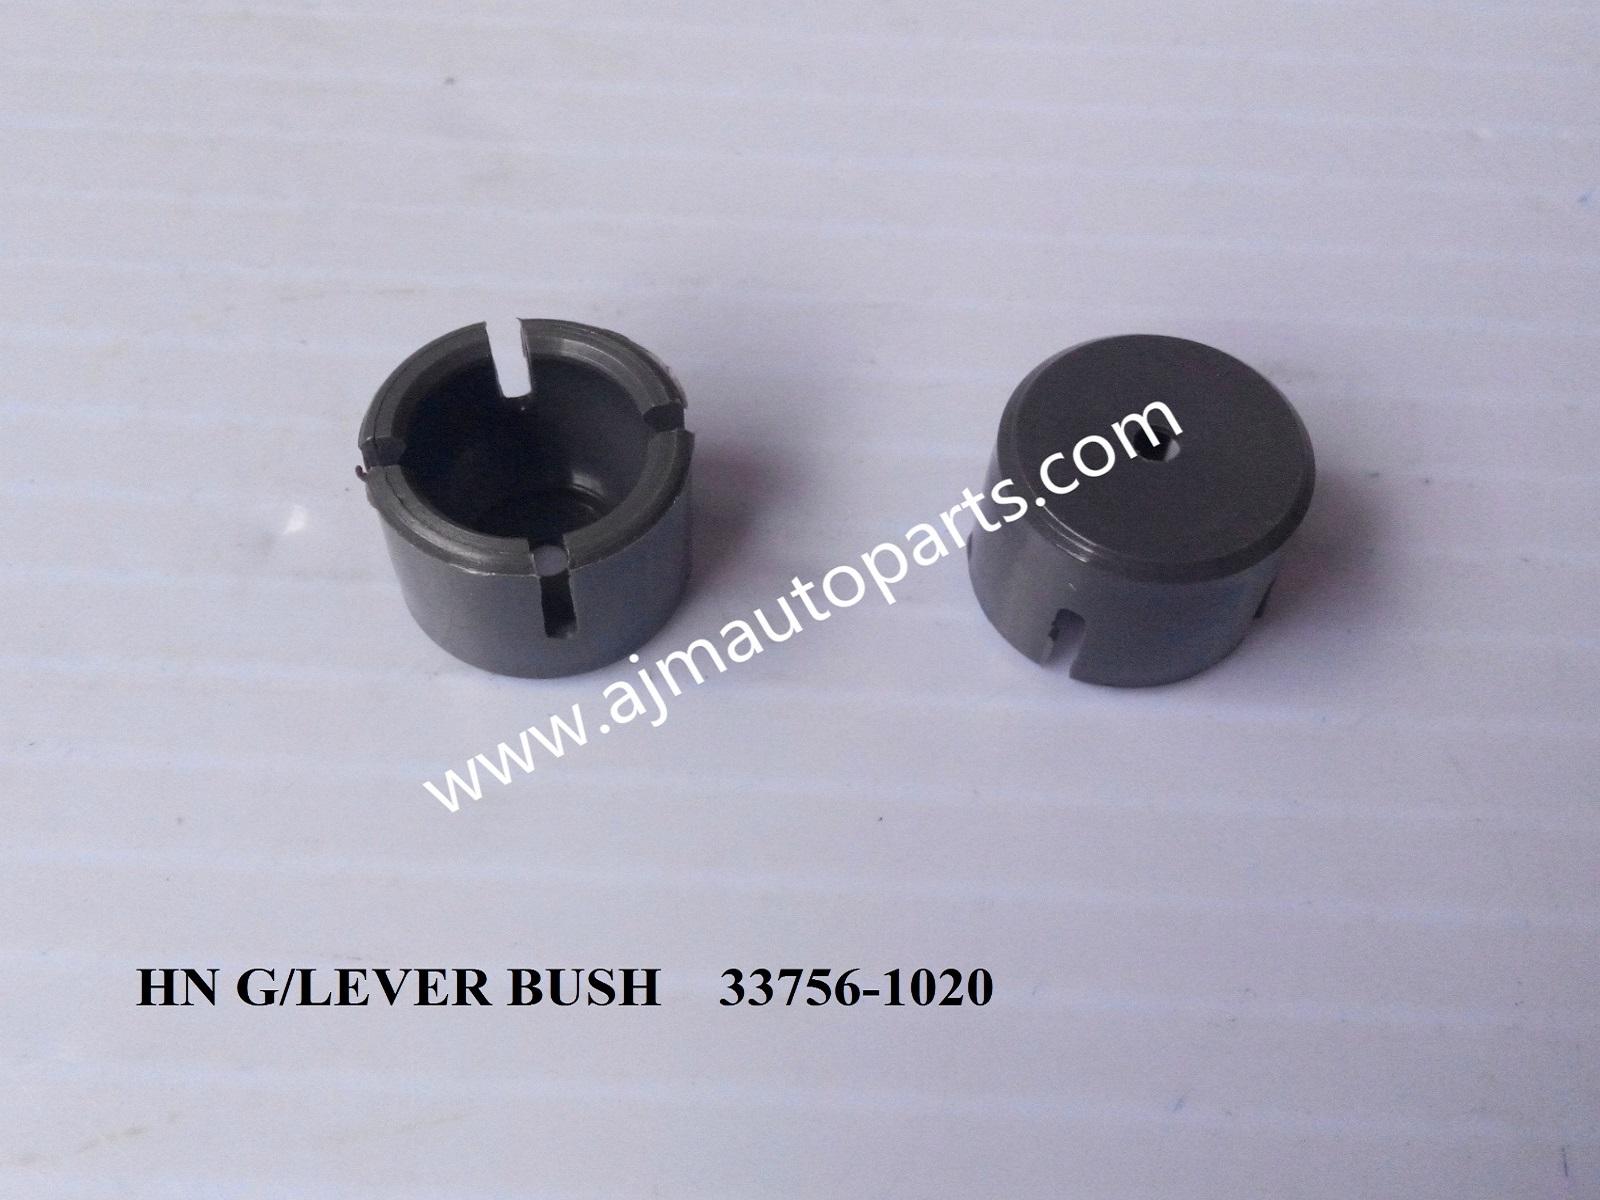 HINO G/LEVEL BUSH-33756-1020